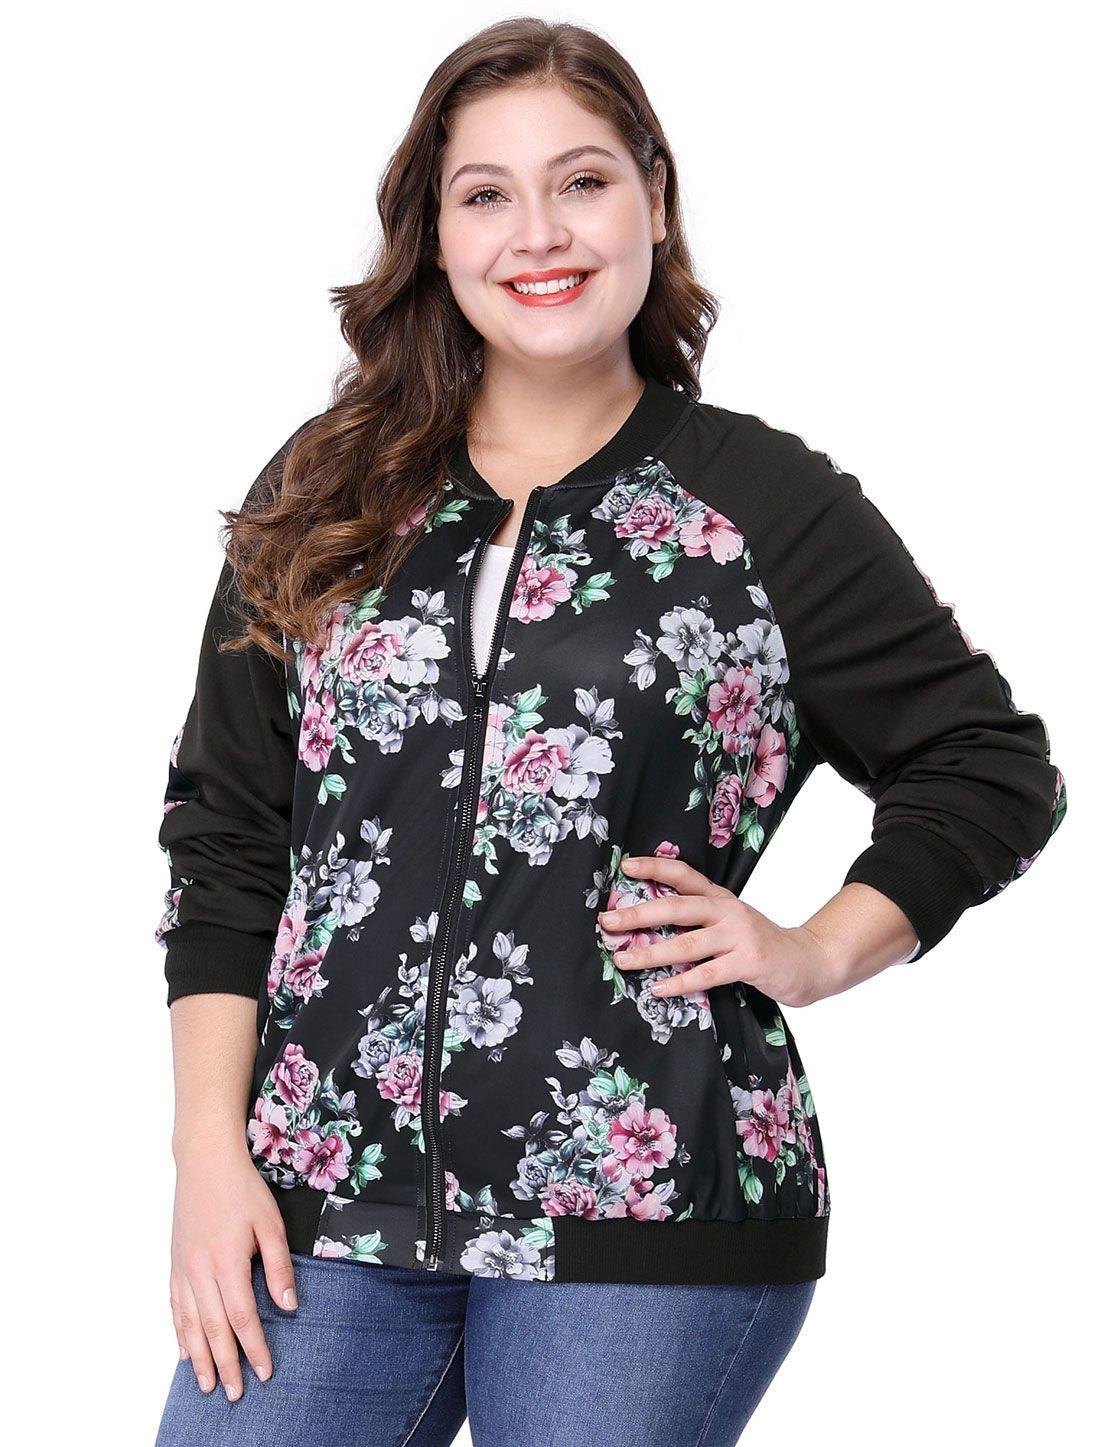 064a89cd19e24 Women s Plus Size Zipper Raglan Sleeves Floral Bomber Jacket - Outerwear